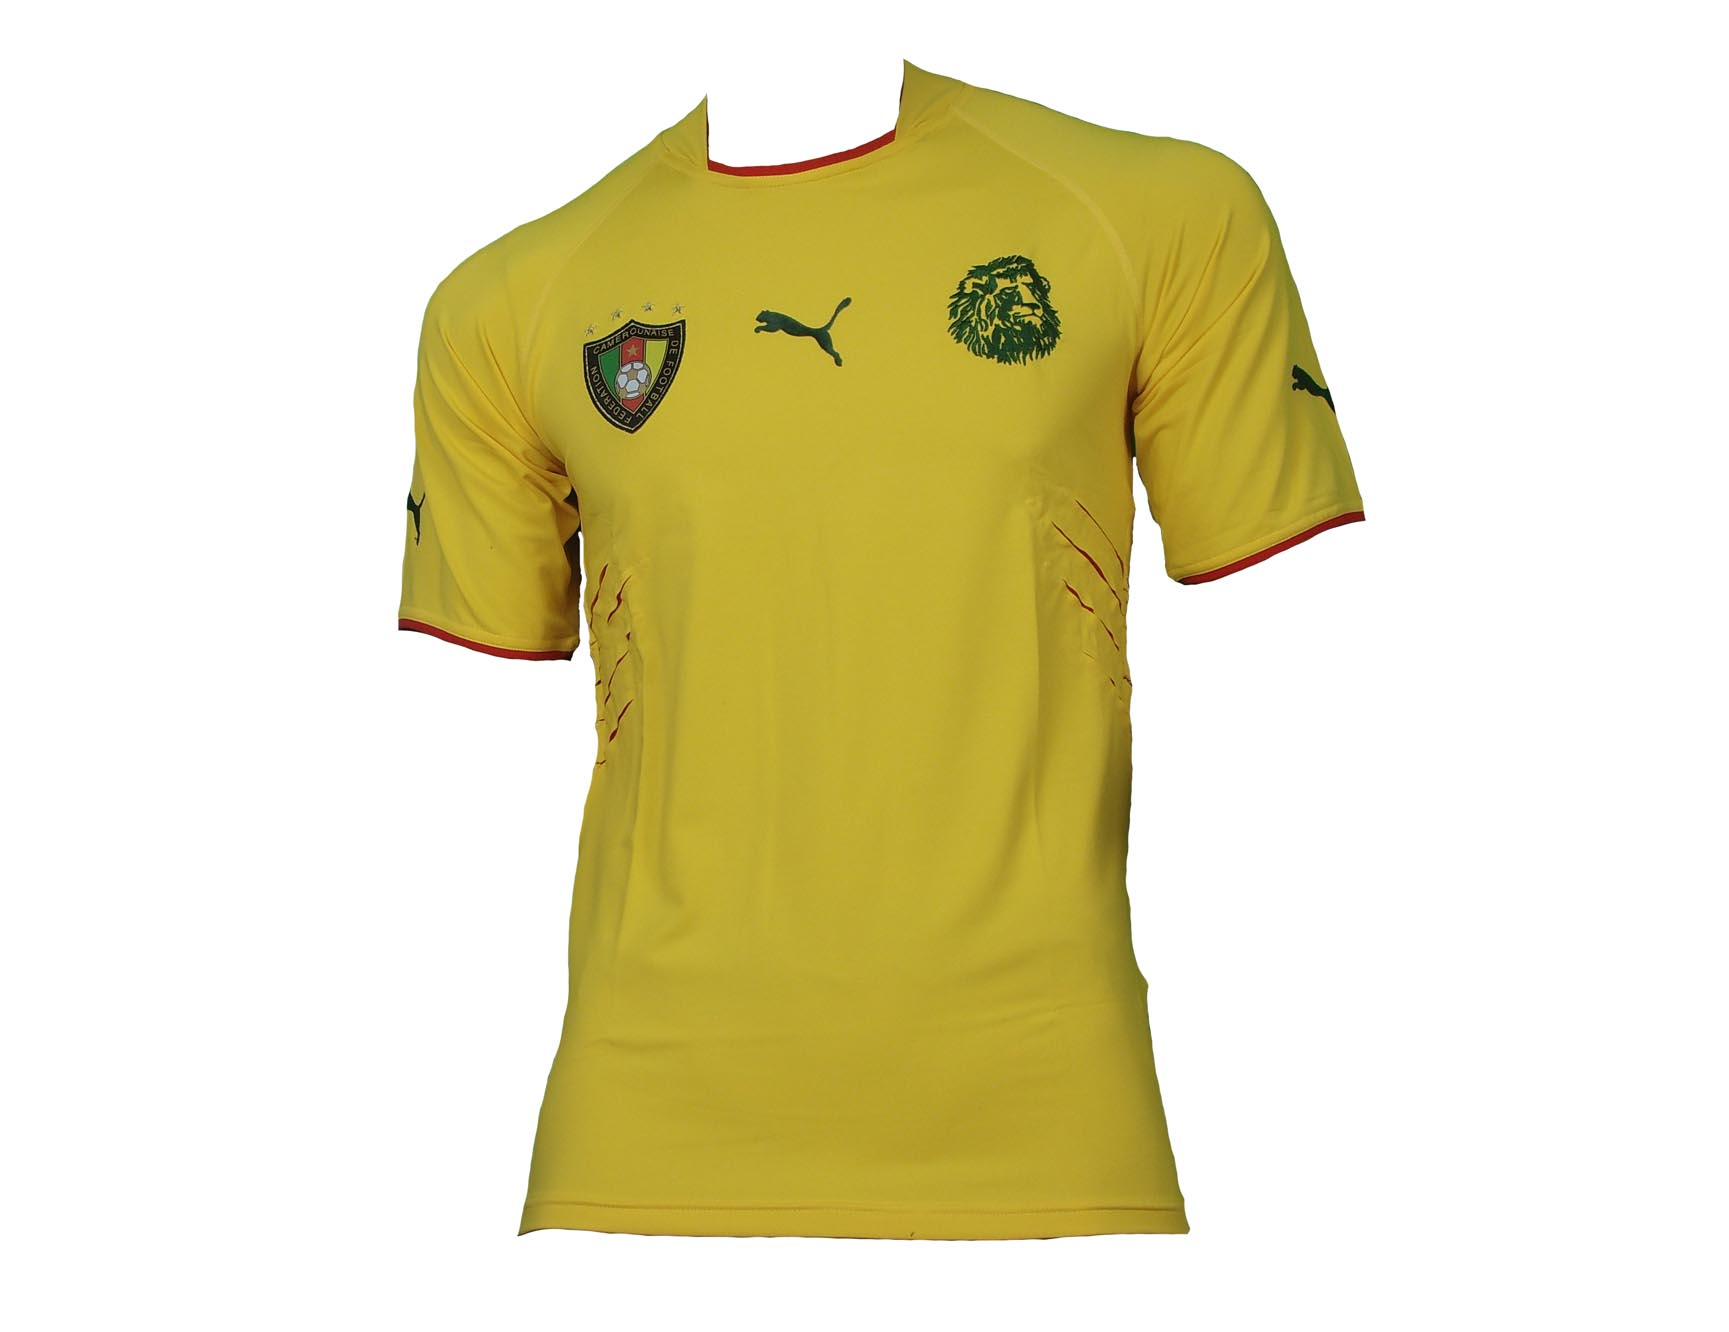 Fußball Fan Trikot Kamerun günstig kaufen | eBay